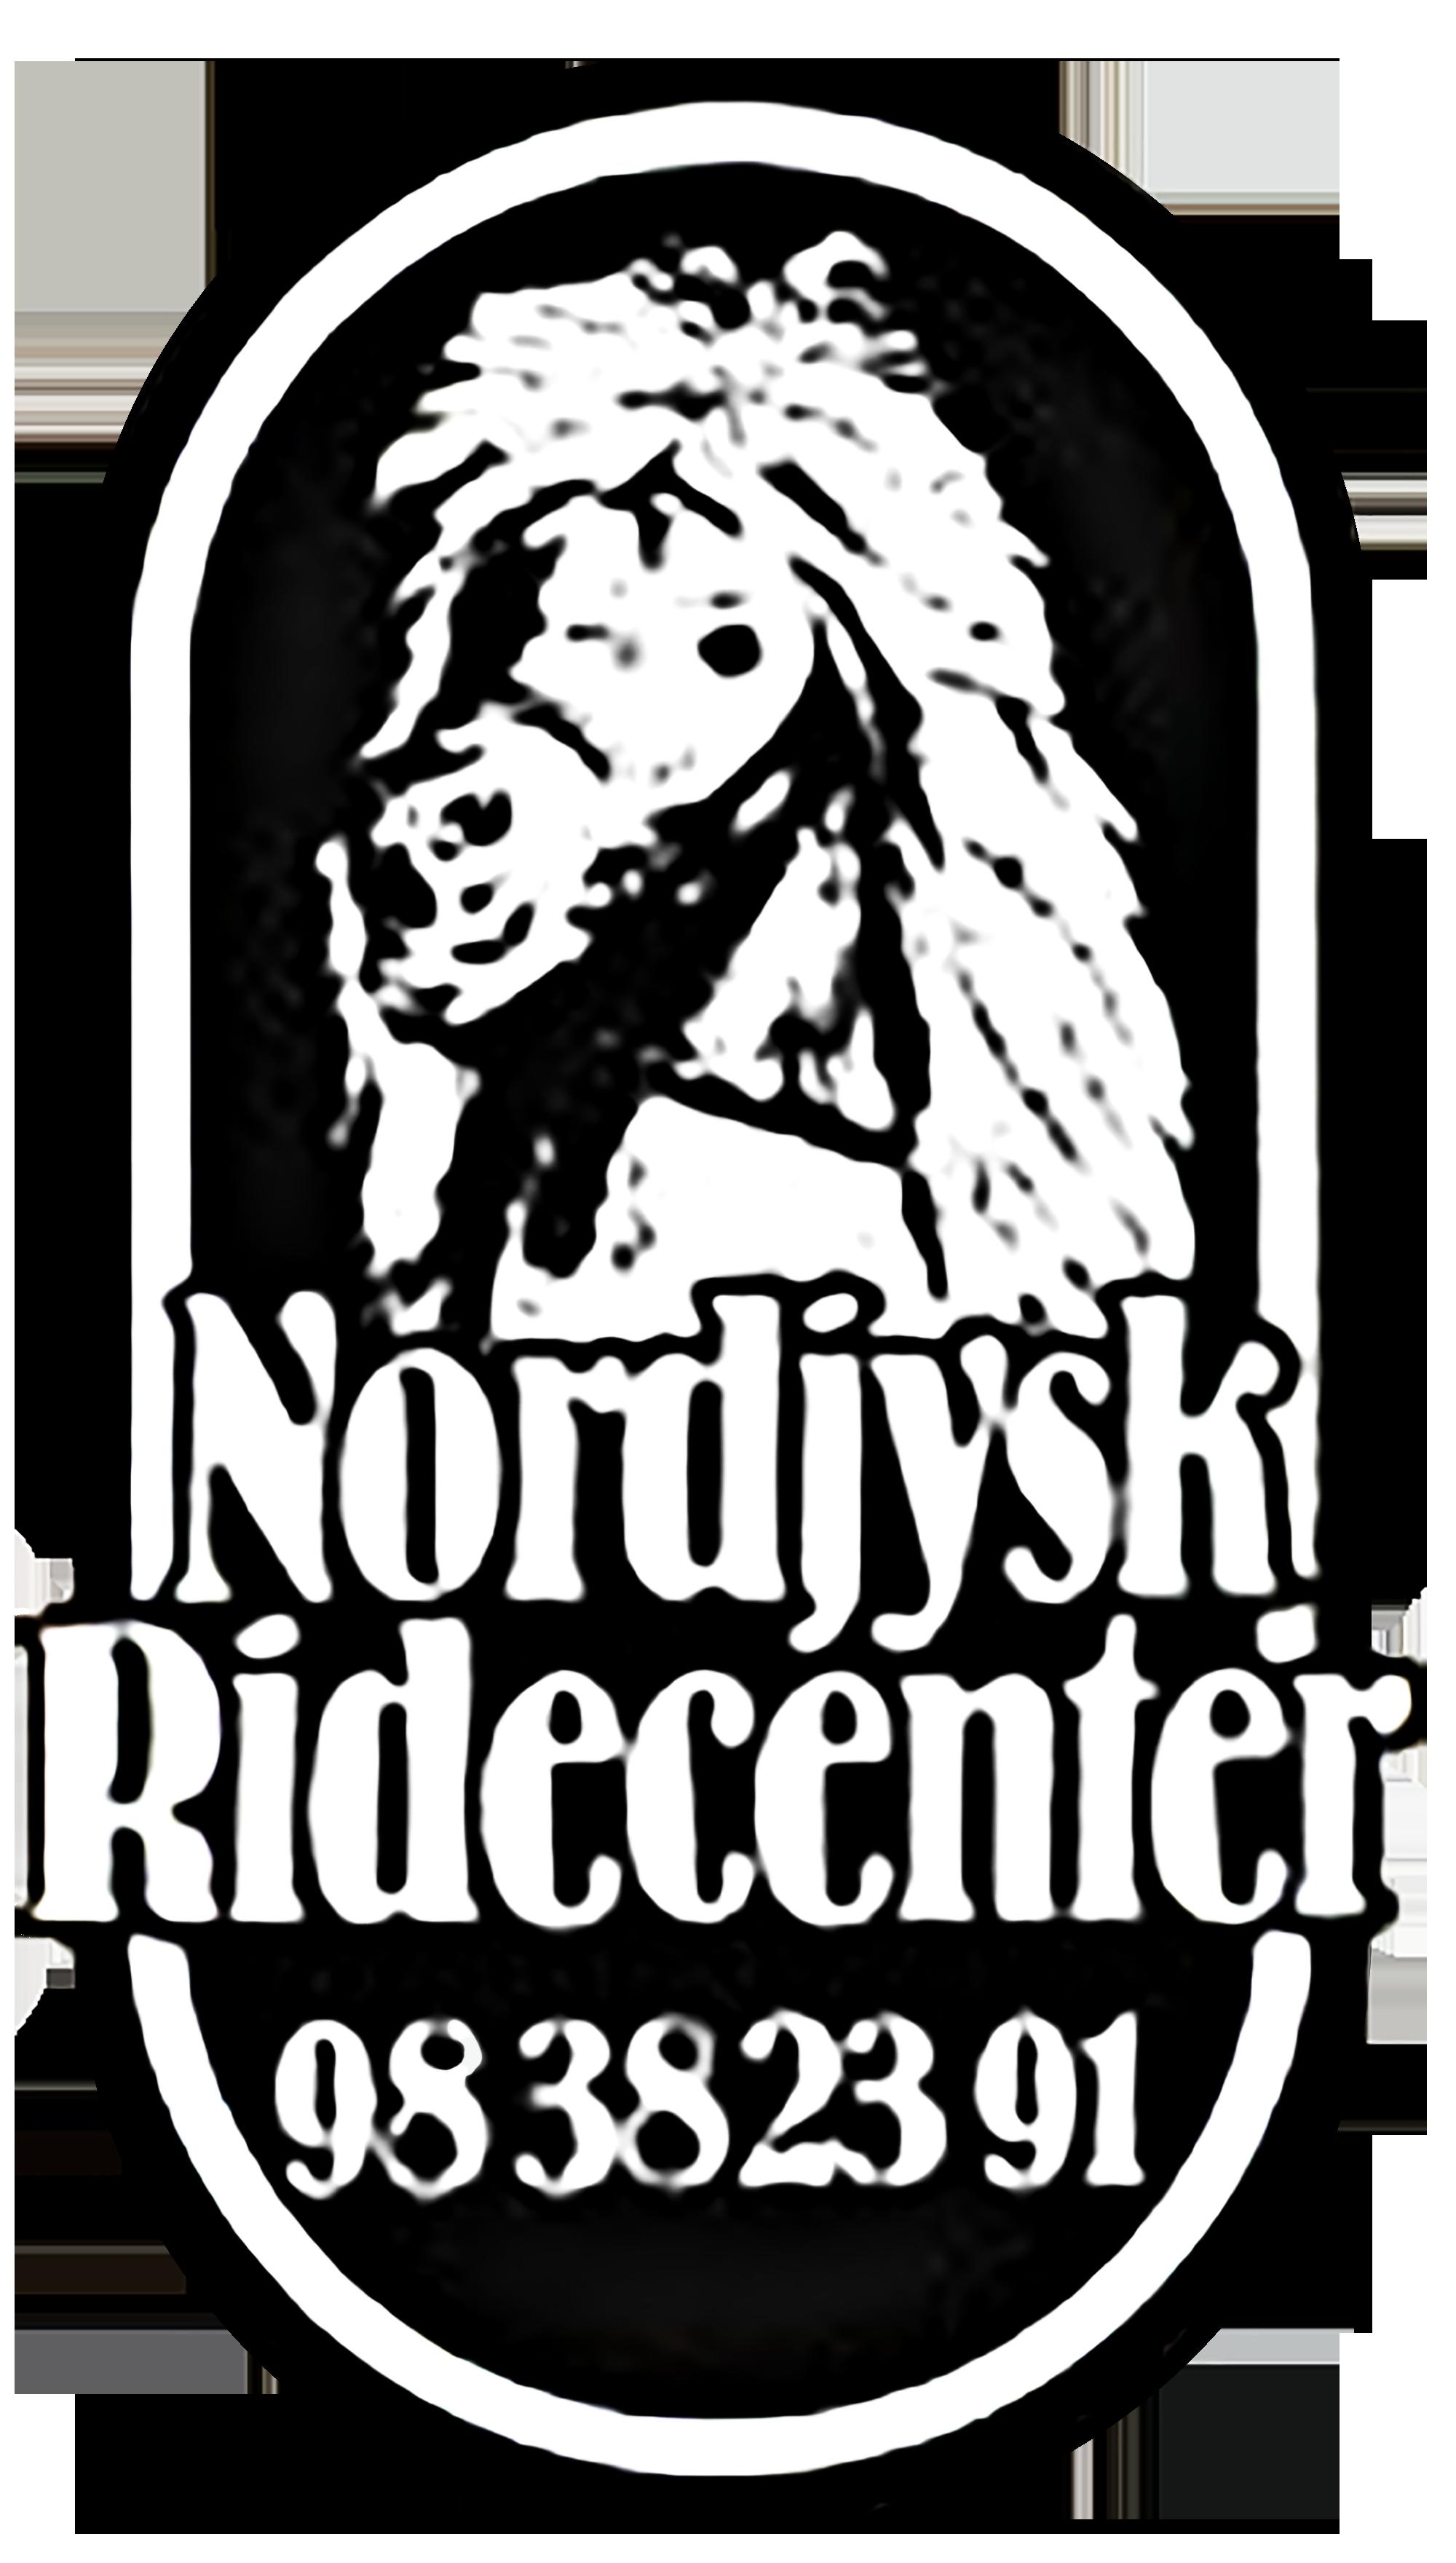 Nordjysk Ridecenter